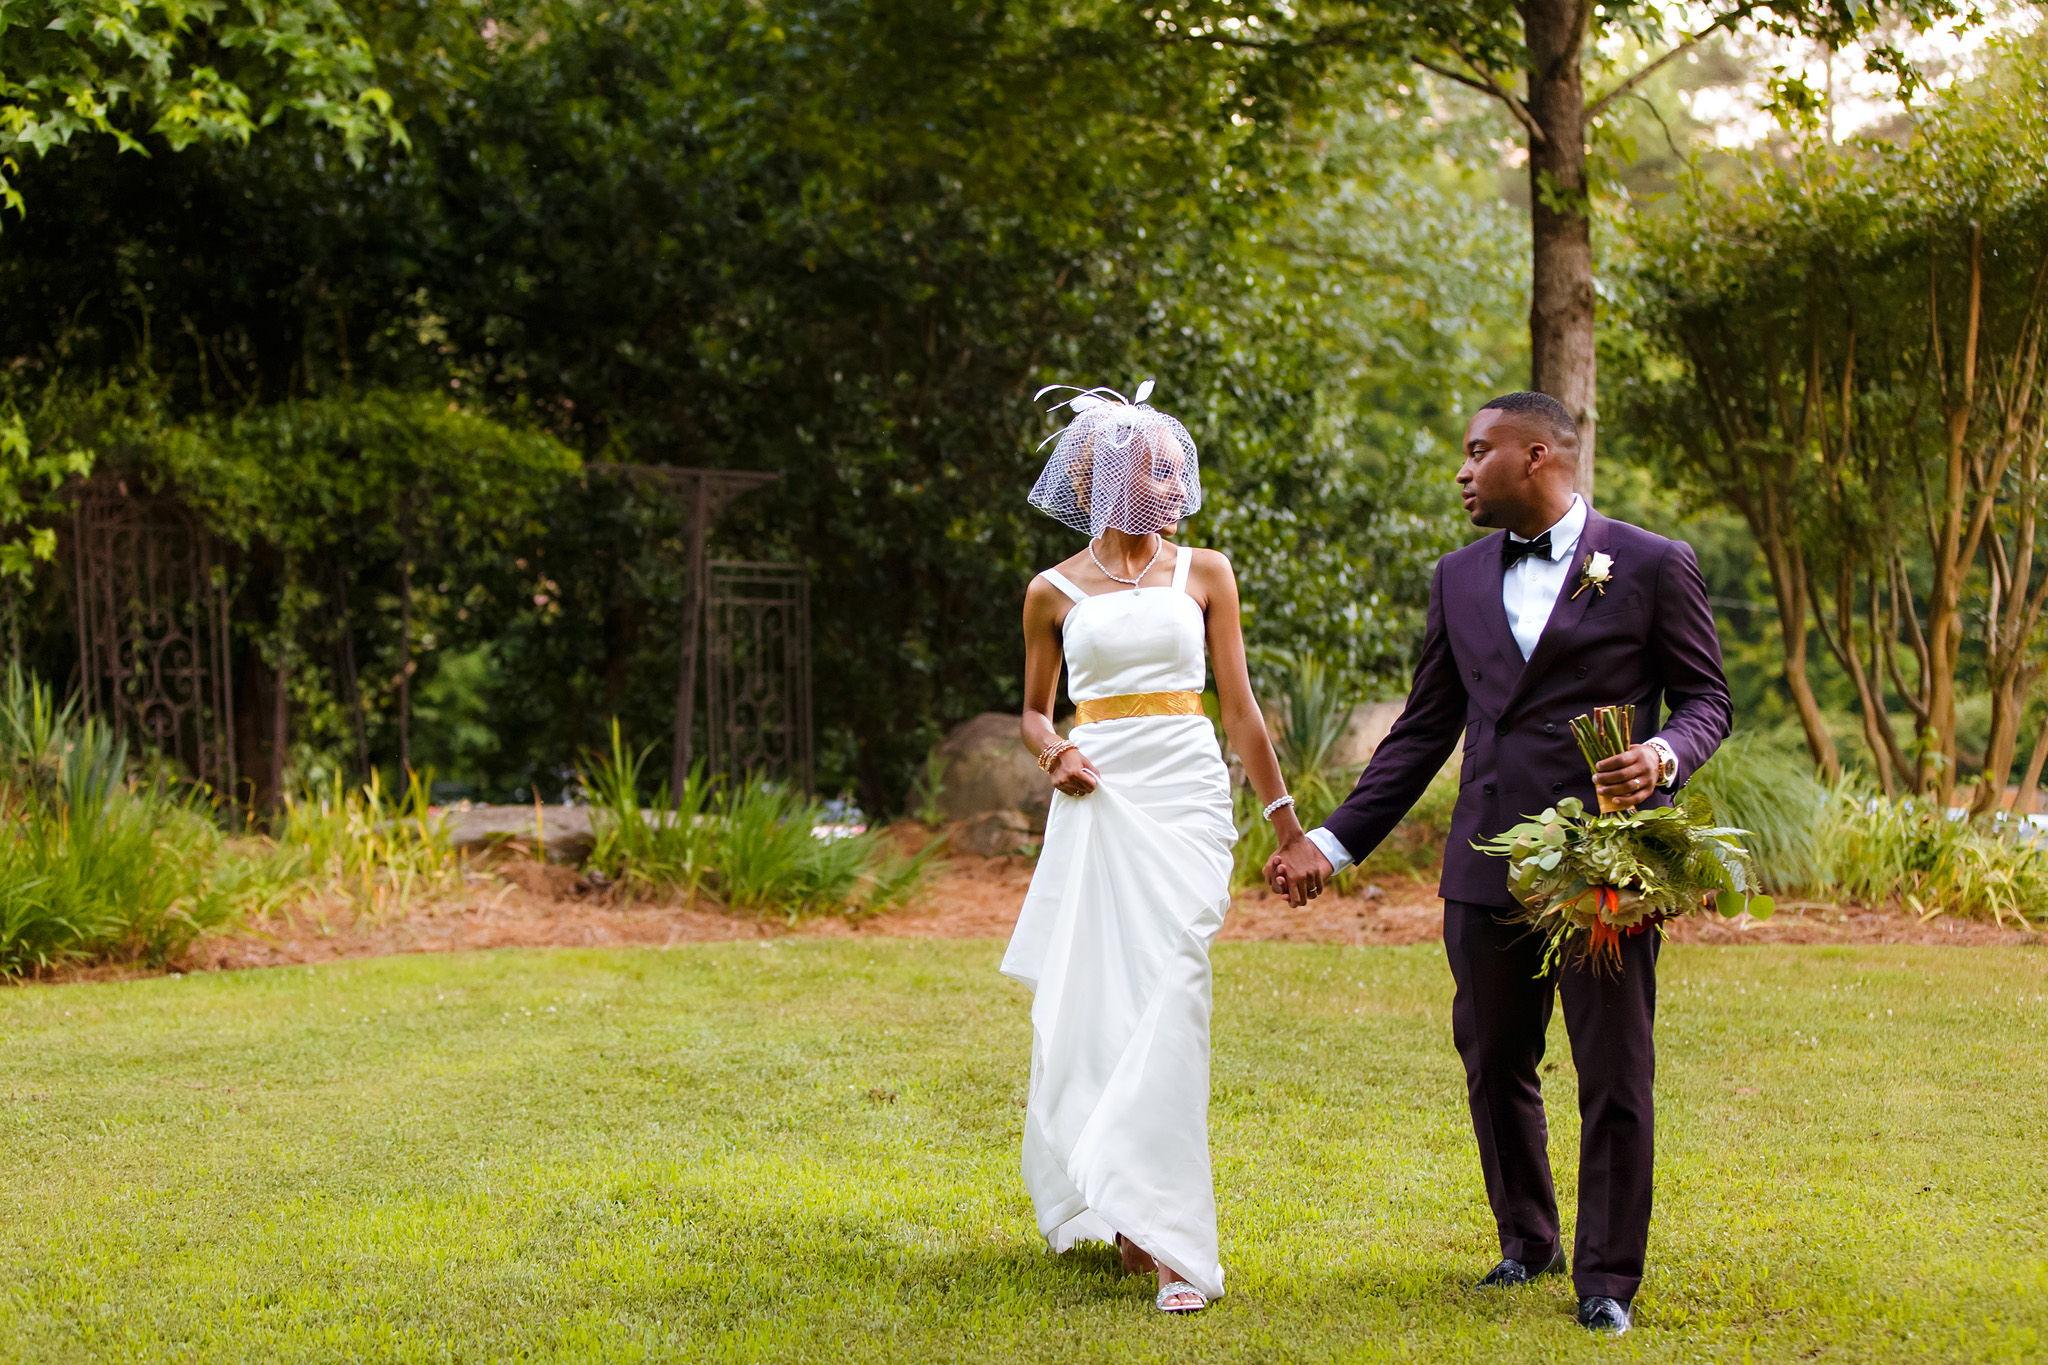 Real Atlanta Wedding: Alexis and Chasten's June Wedding at Vecoma